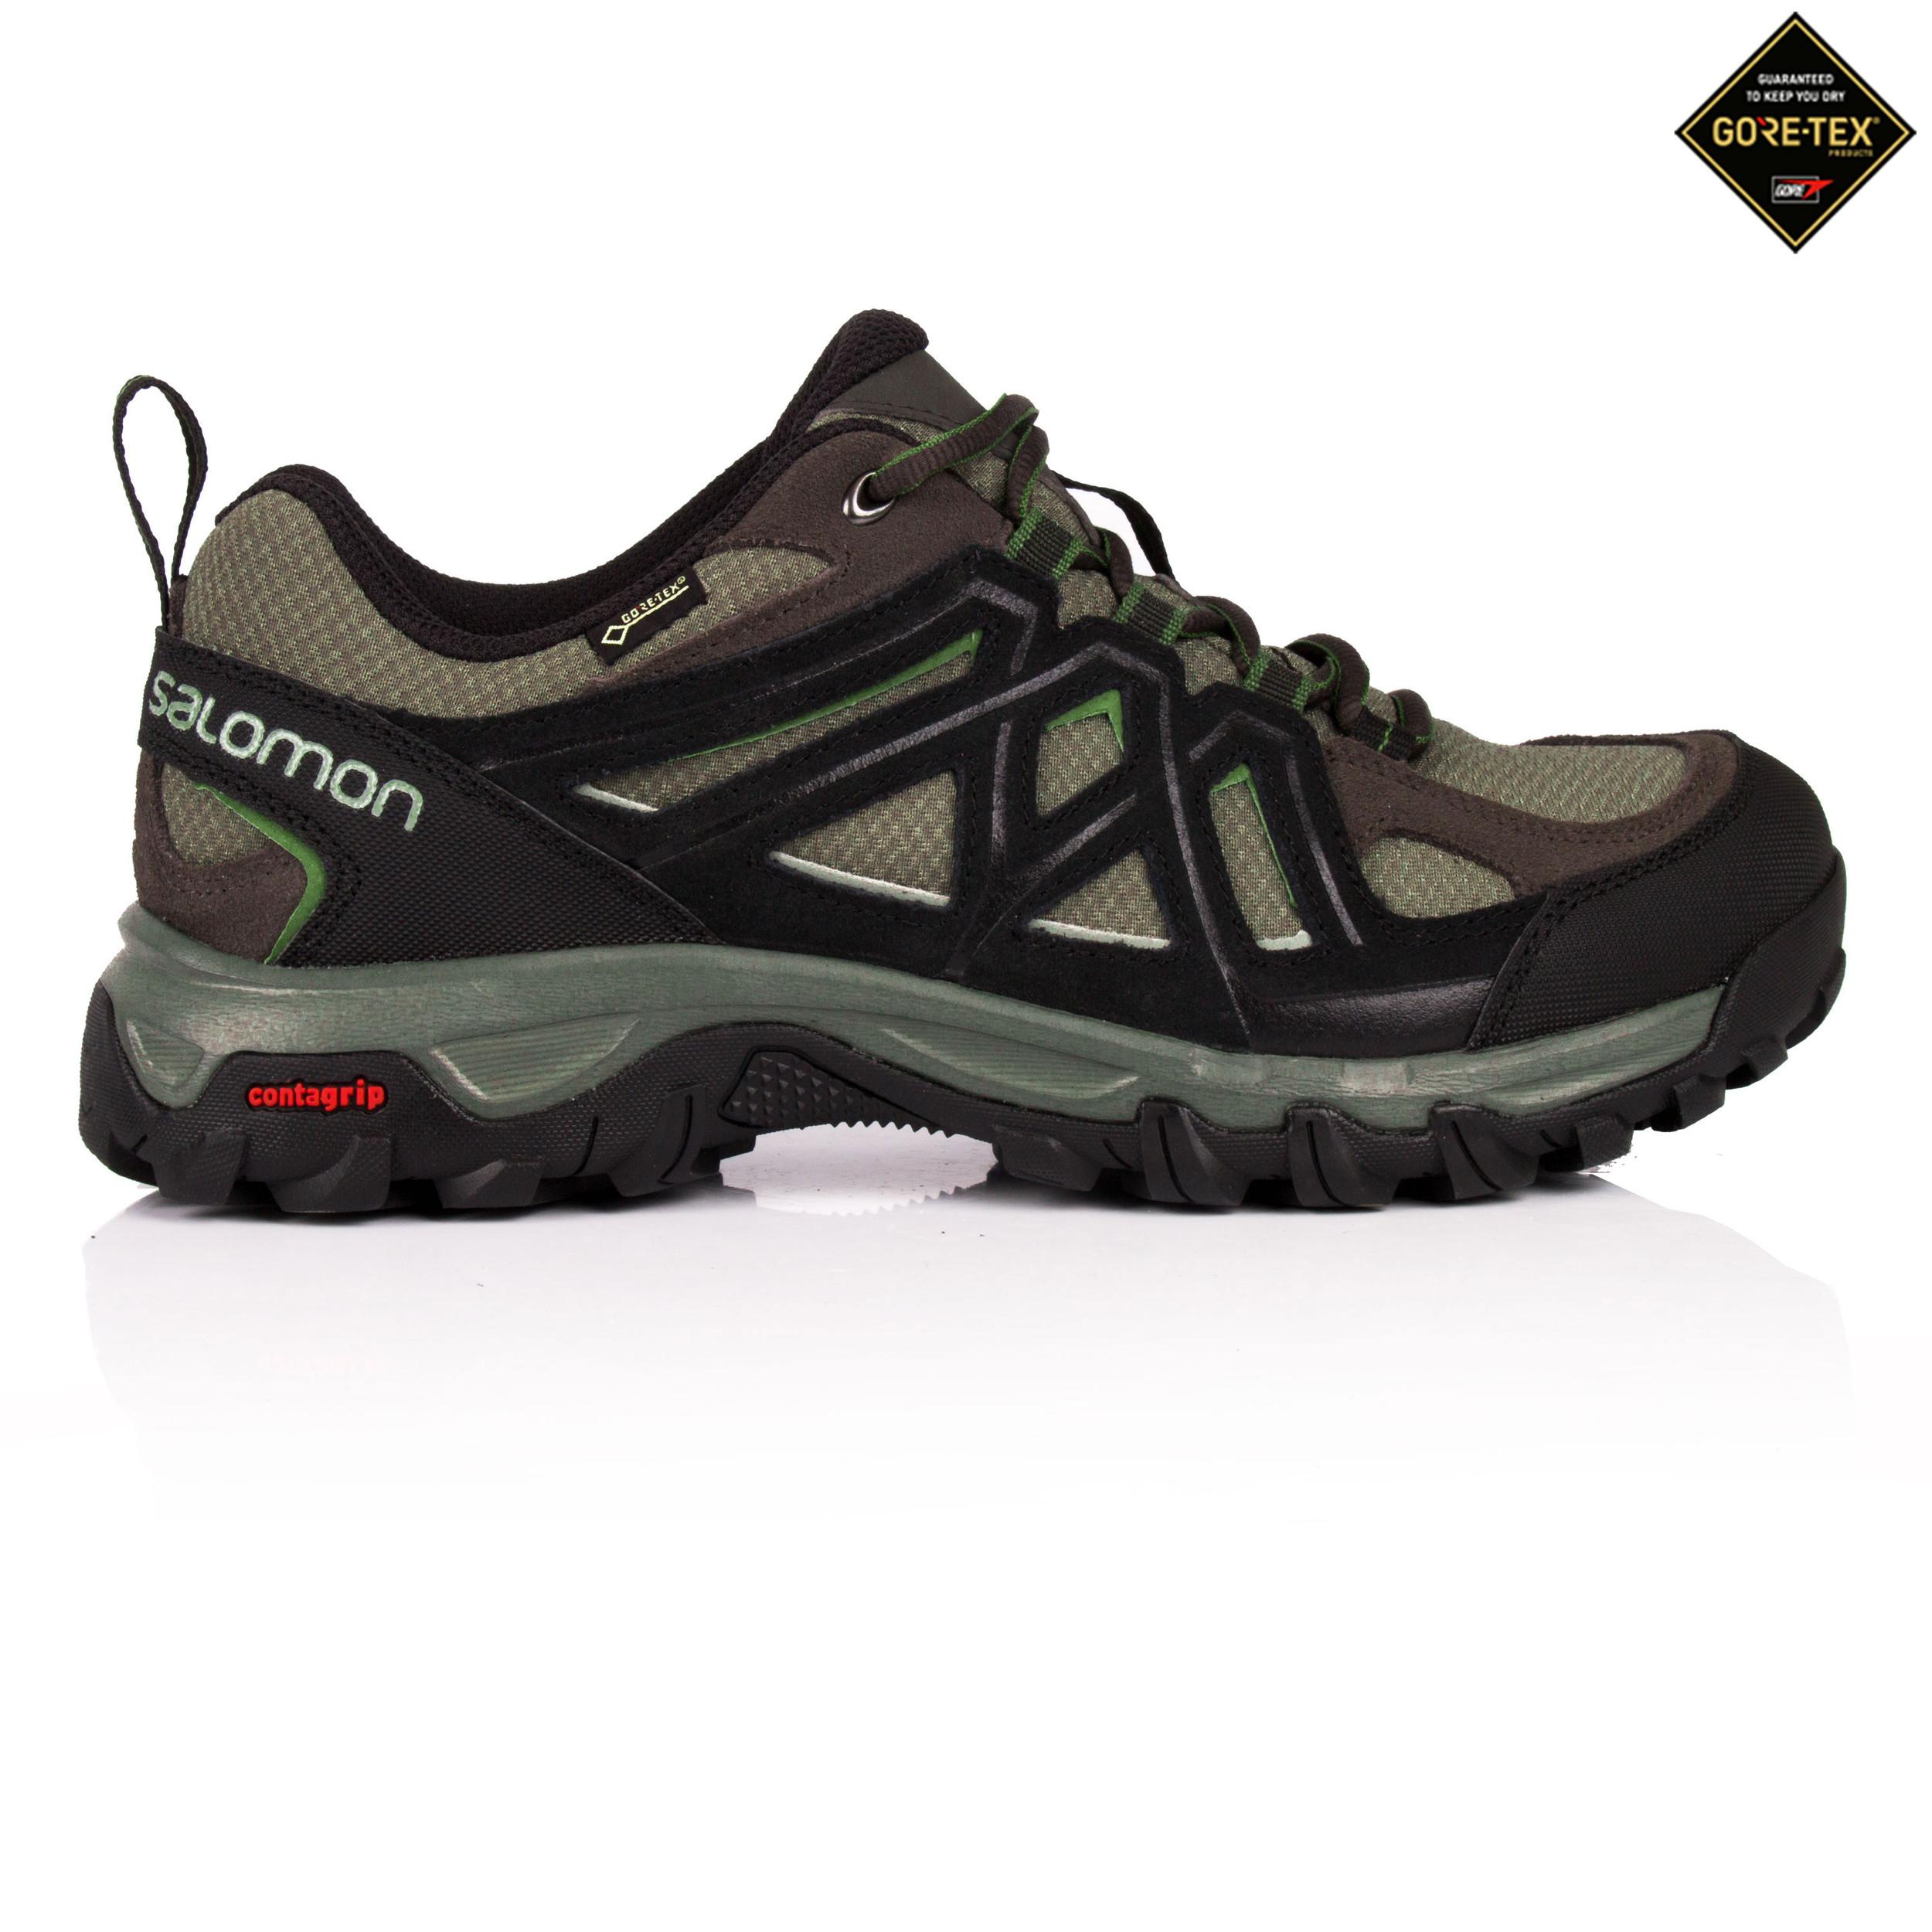 9a5d88baa305 Details about Salomon Evasion 2 Mens Black Waterproof Gore Tex Walking  Hiking Shoes